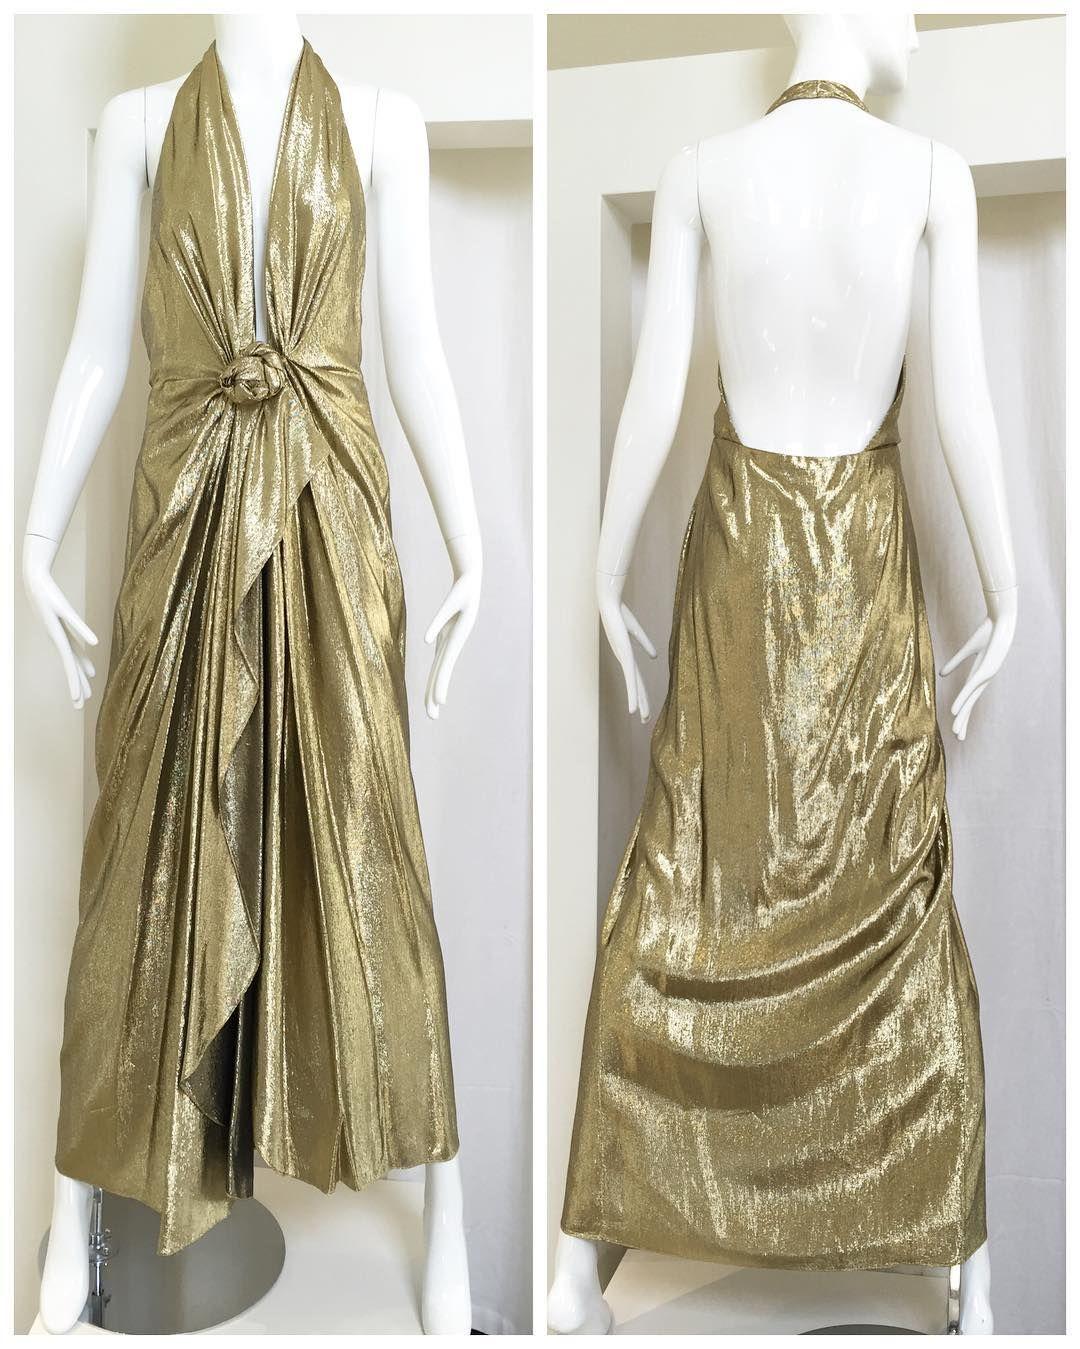 1970s lamé halter dress #vintagefashion #vintagedesigner #sielianvintage #1970sdress #1970sfashion #vintagedesigner by sielianvintage